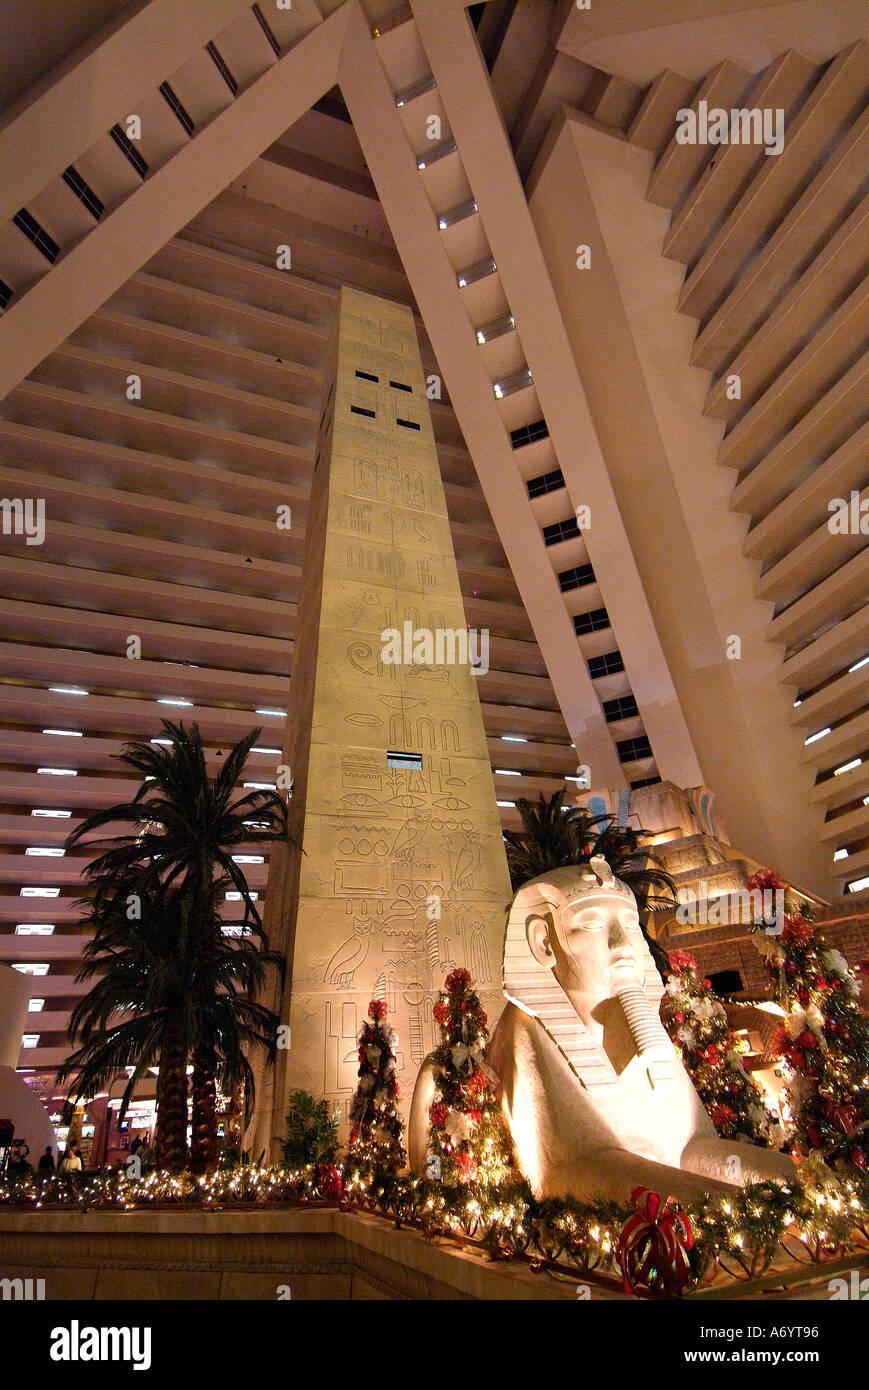 Luxor Hotel And Casino Interior Stock Photos & Luxor Hotel And Casino Interior Stock Images - Alamy